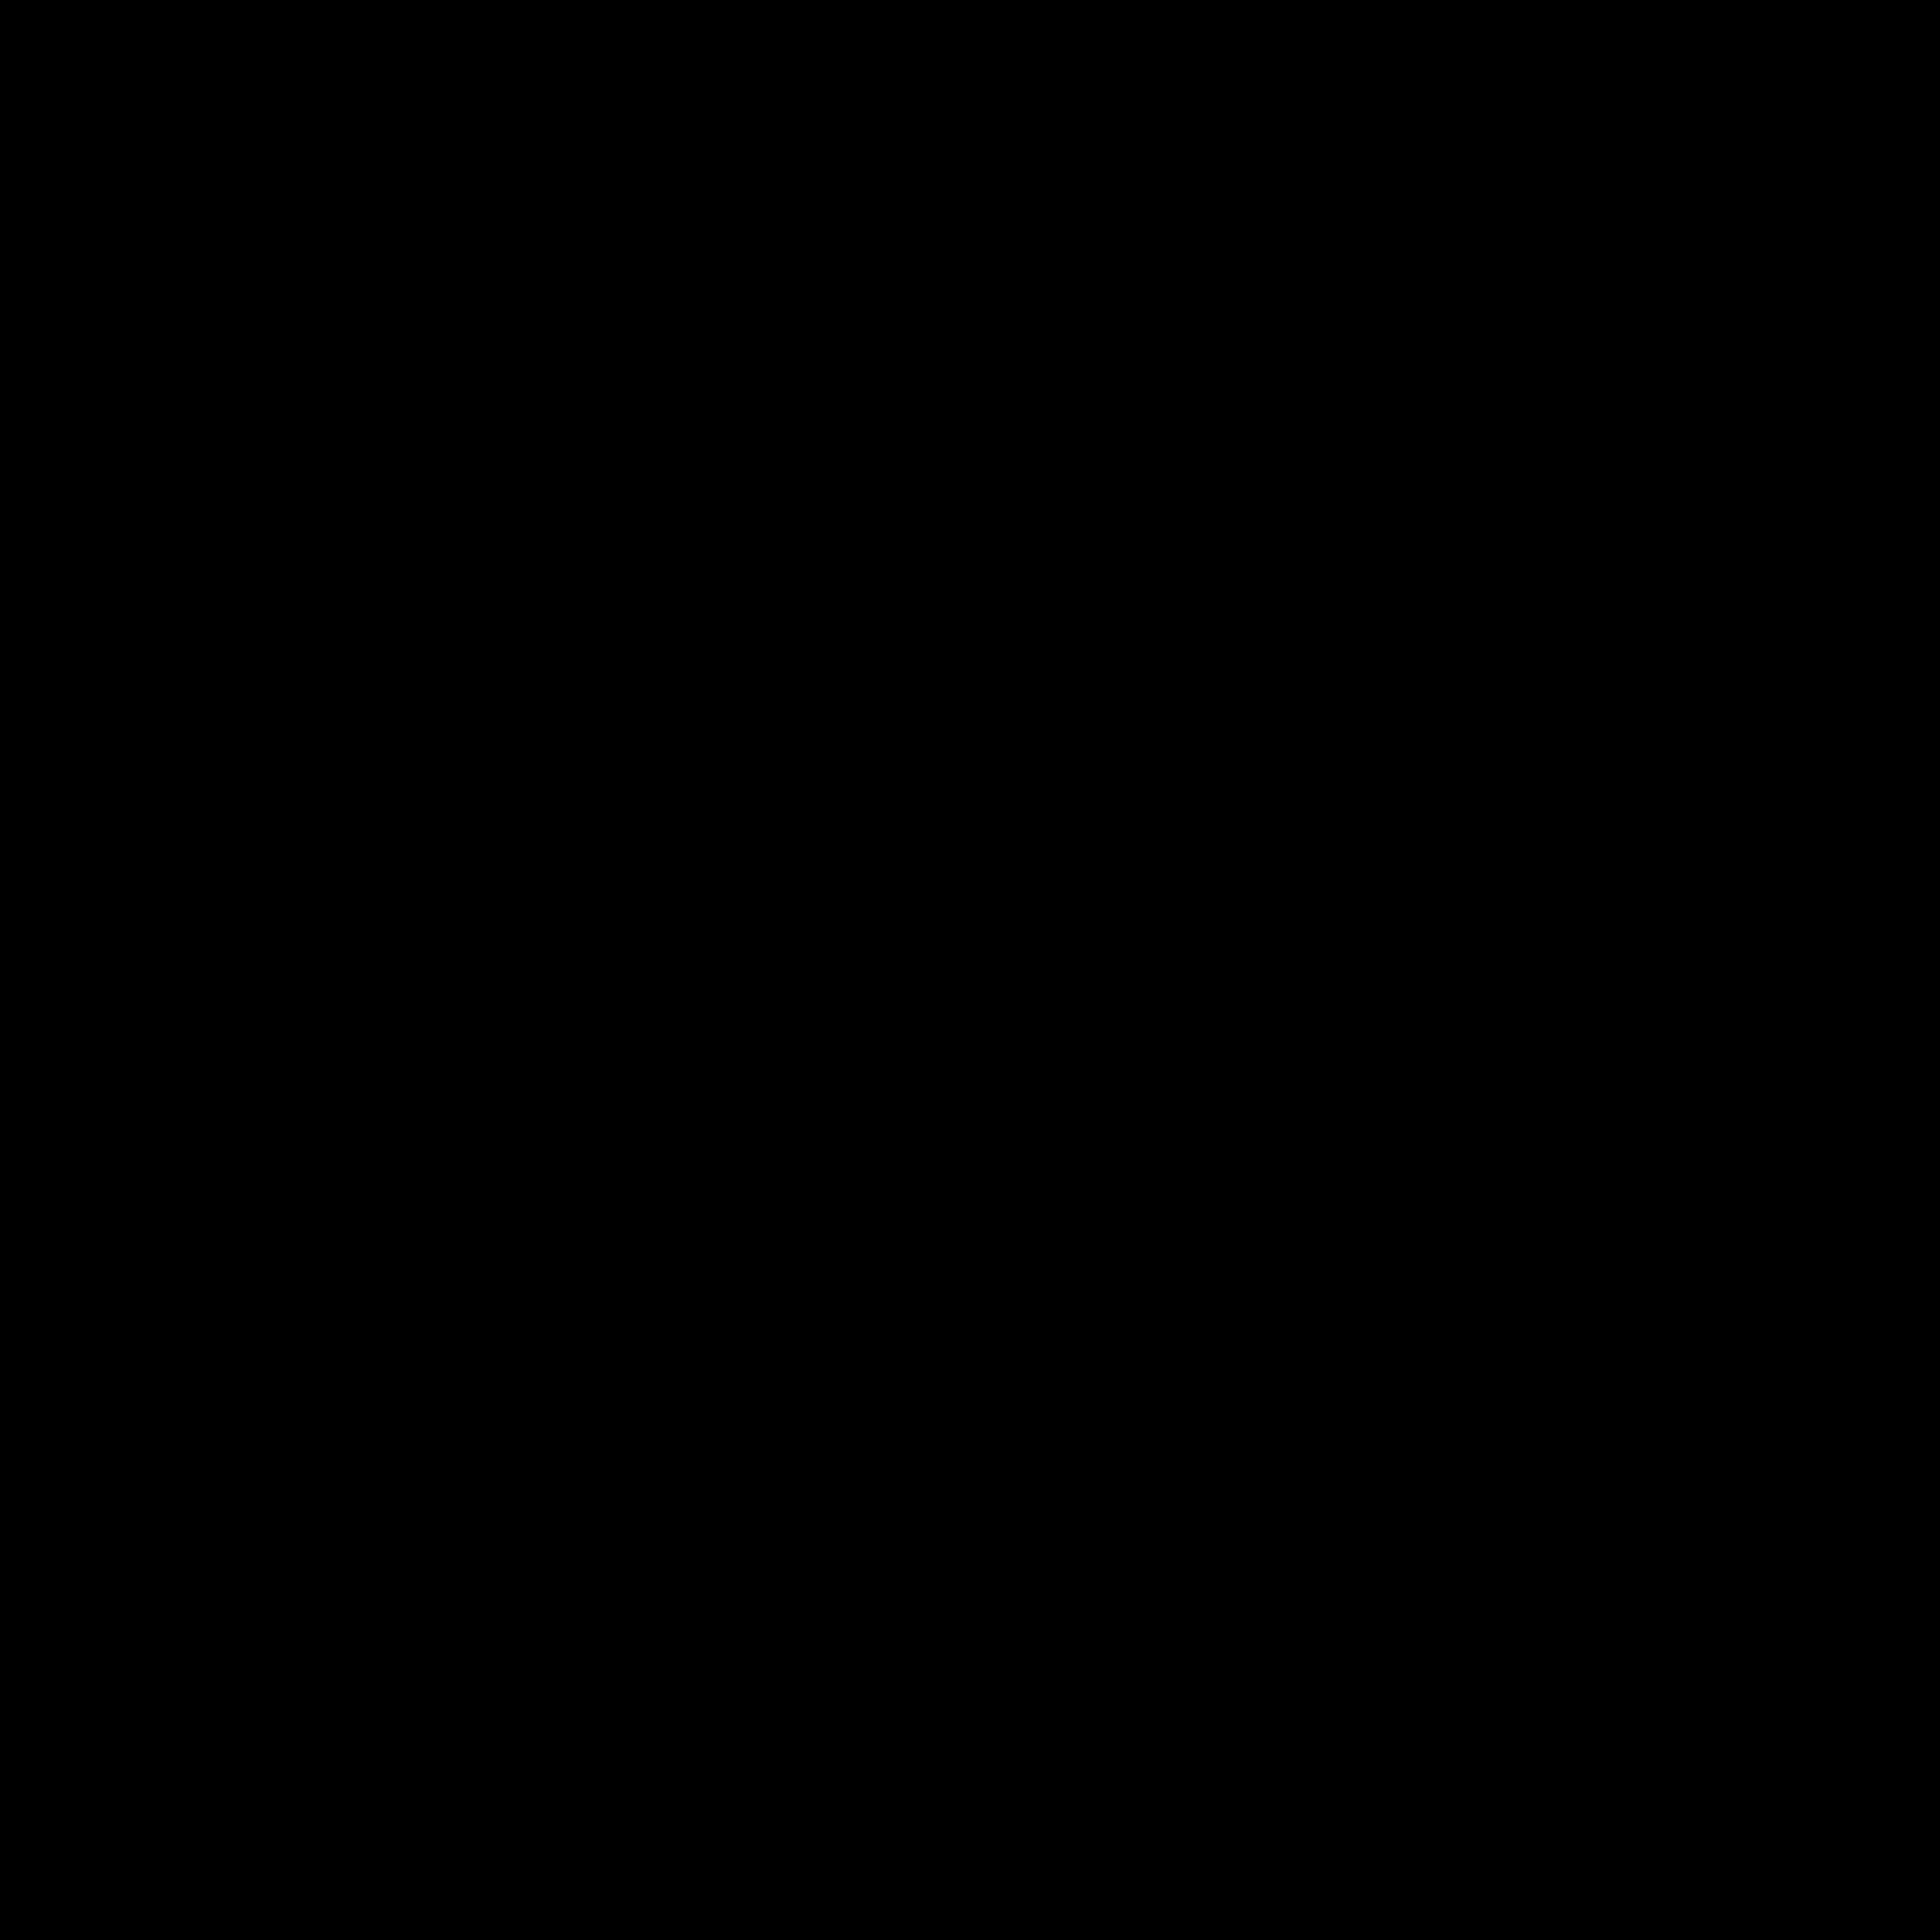 apple logo for cricut Google Search Apple logo, Apple